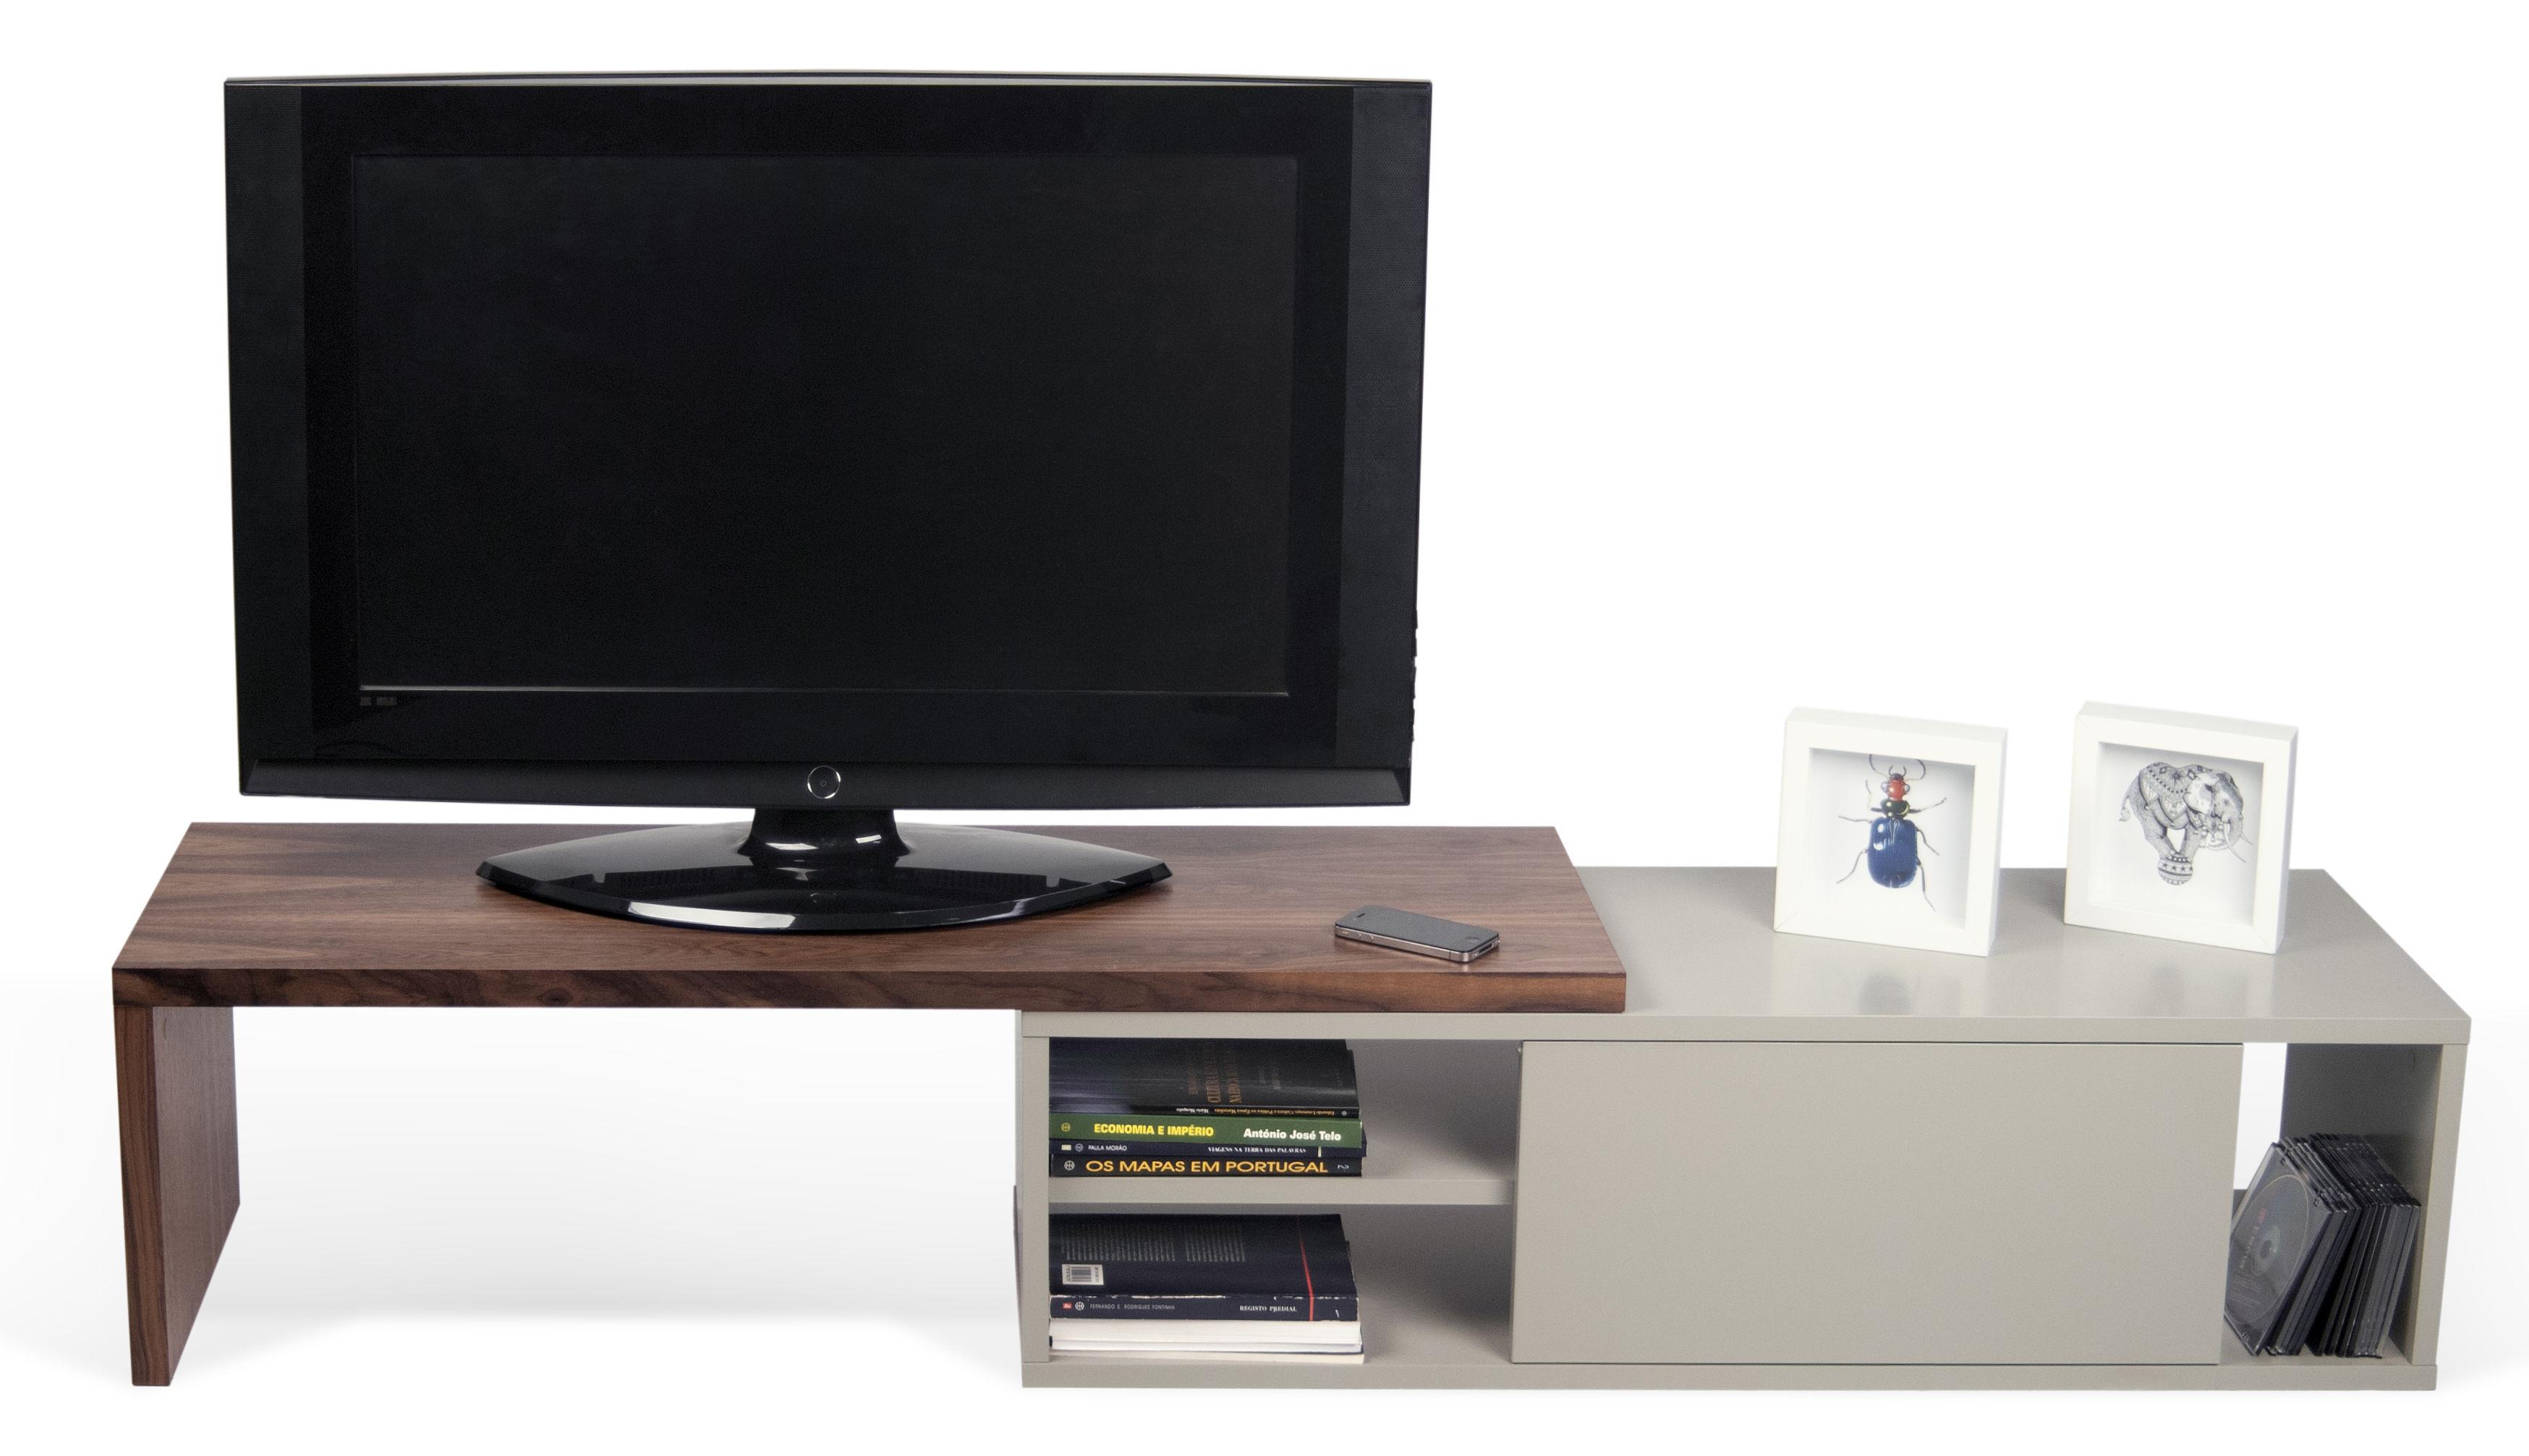 meuble tv extensible slide pivotant l 110 203 cm gris noyer pop up home. Black Bedroom Furniture Sets. Home Design Ideas